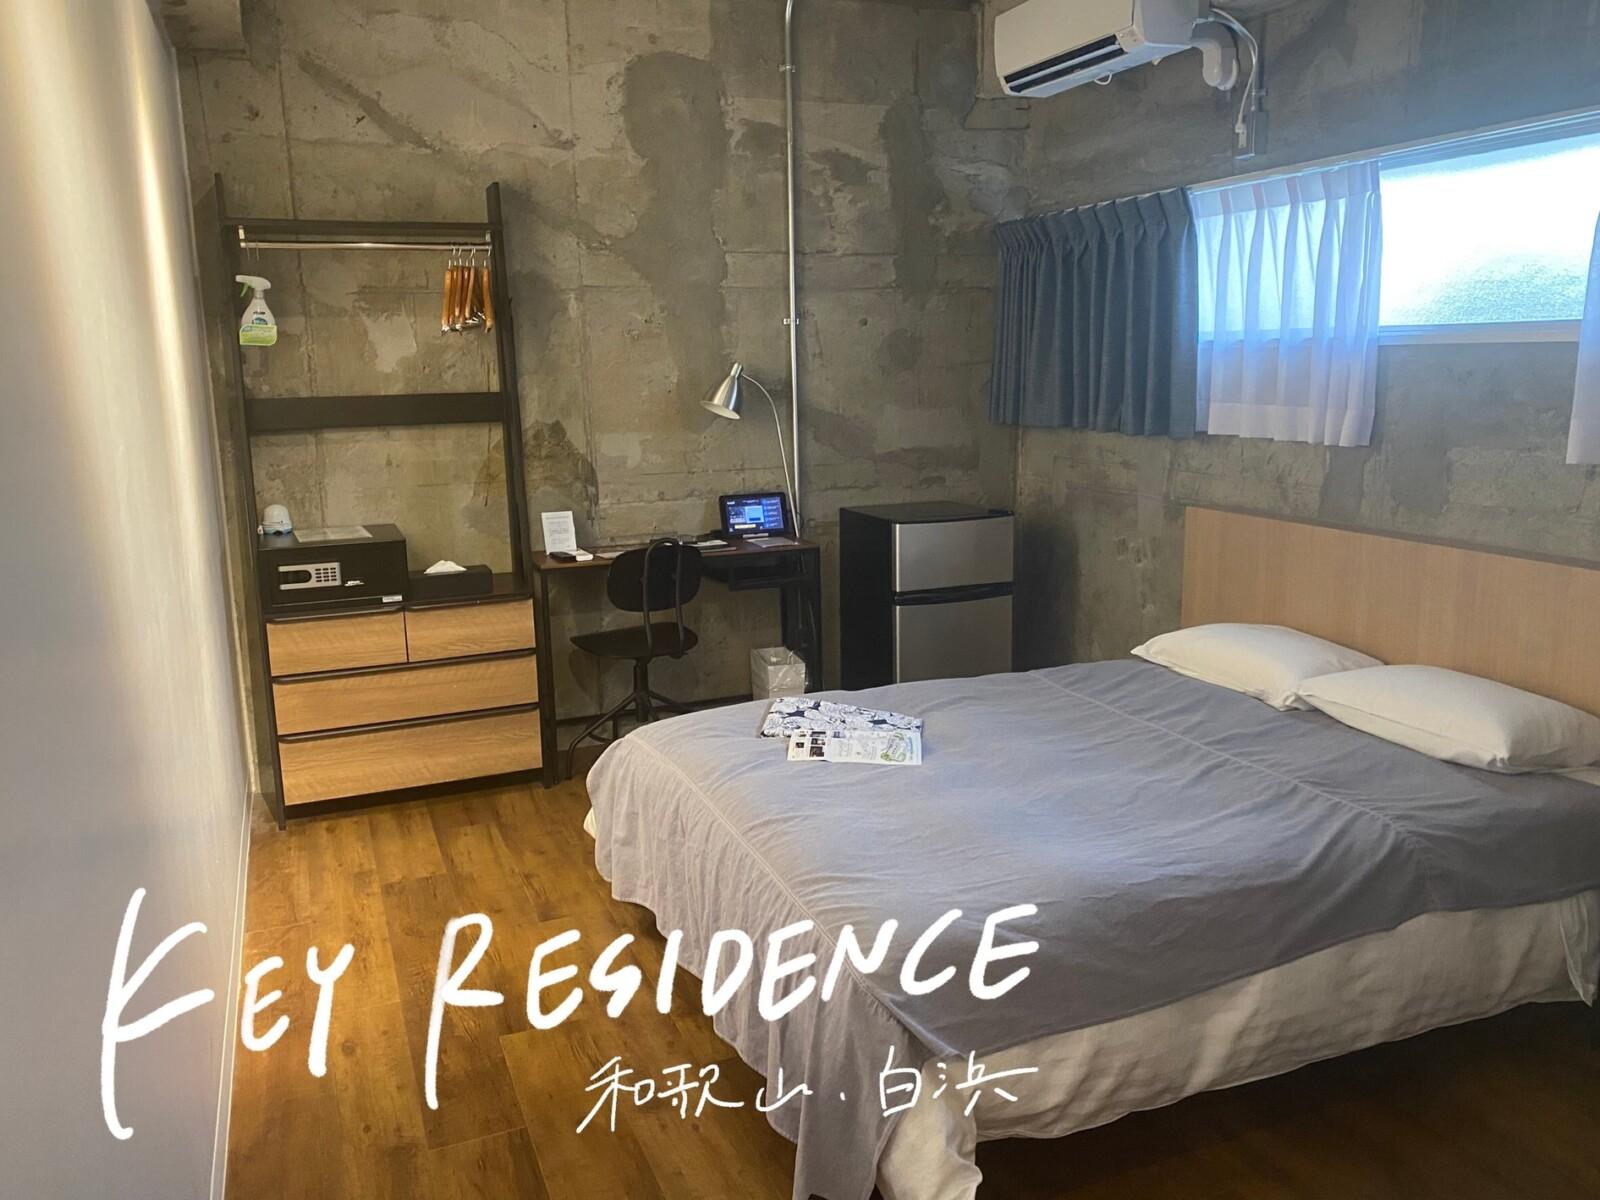 KEY RESIDENCE 部屋